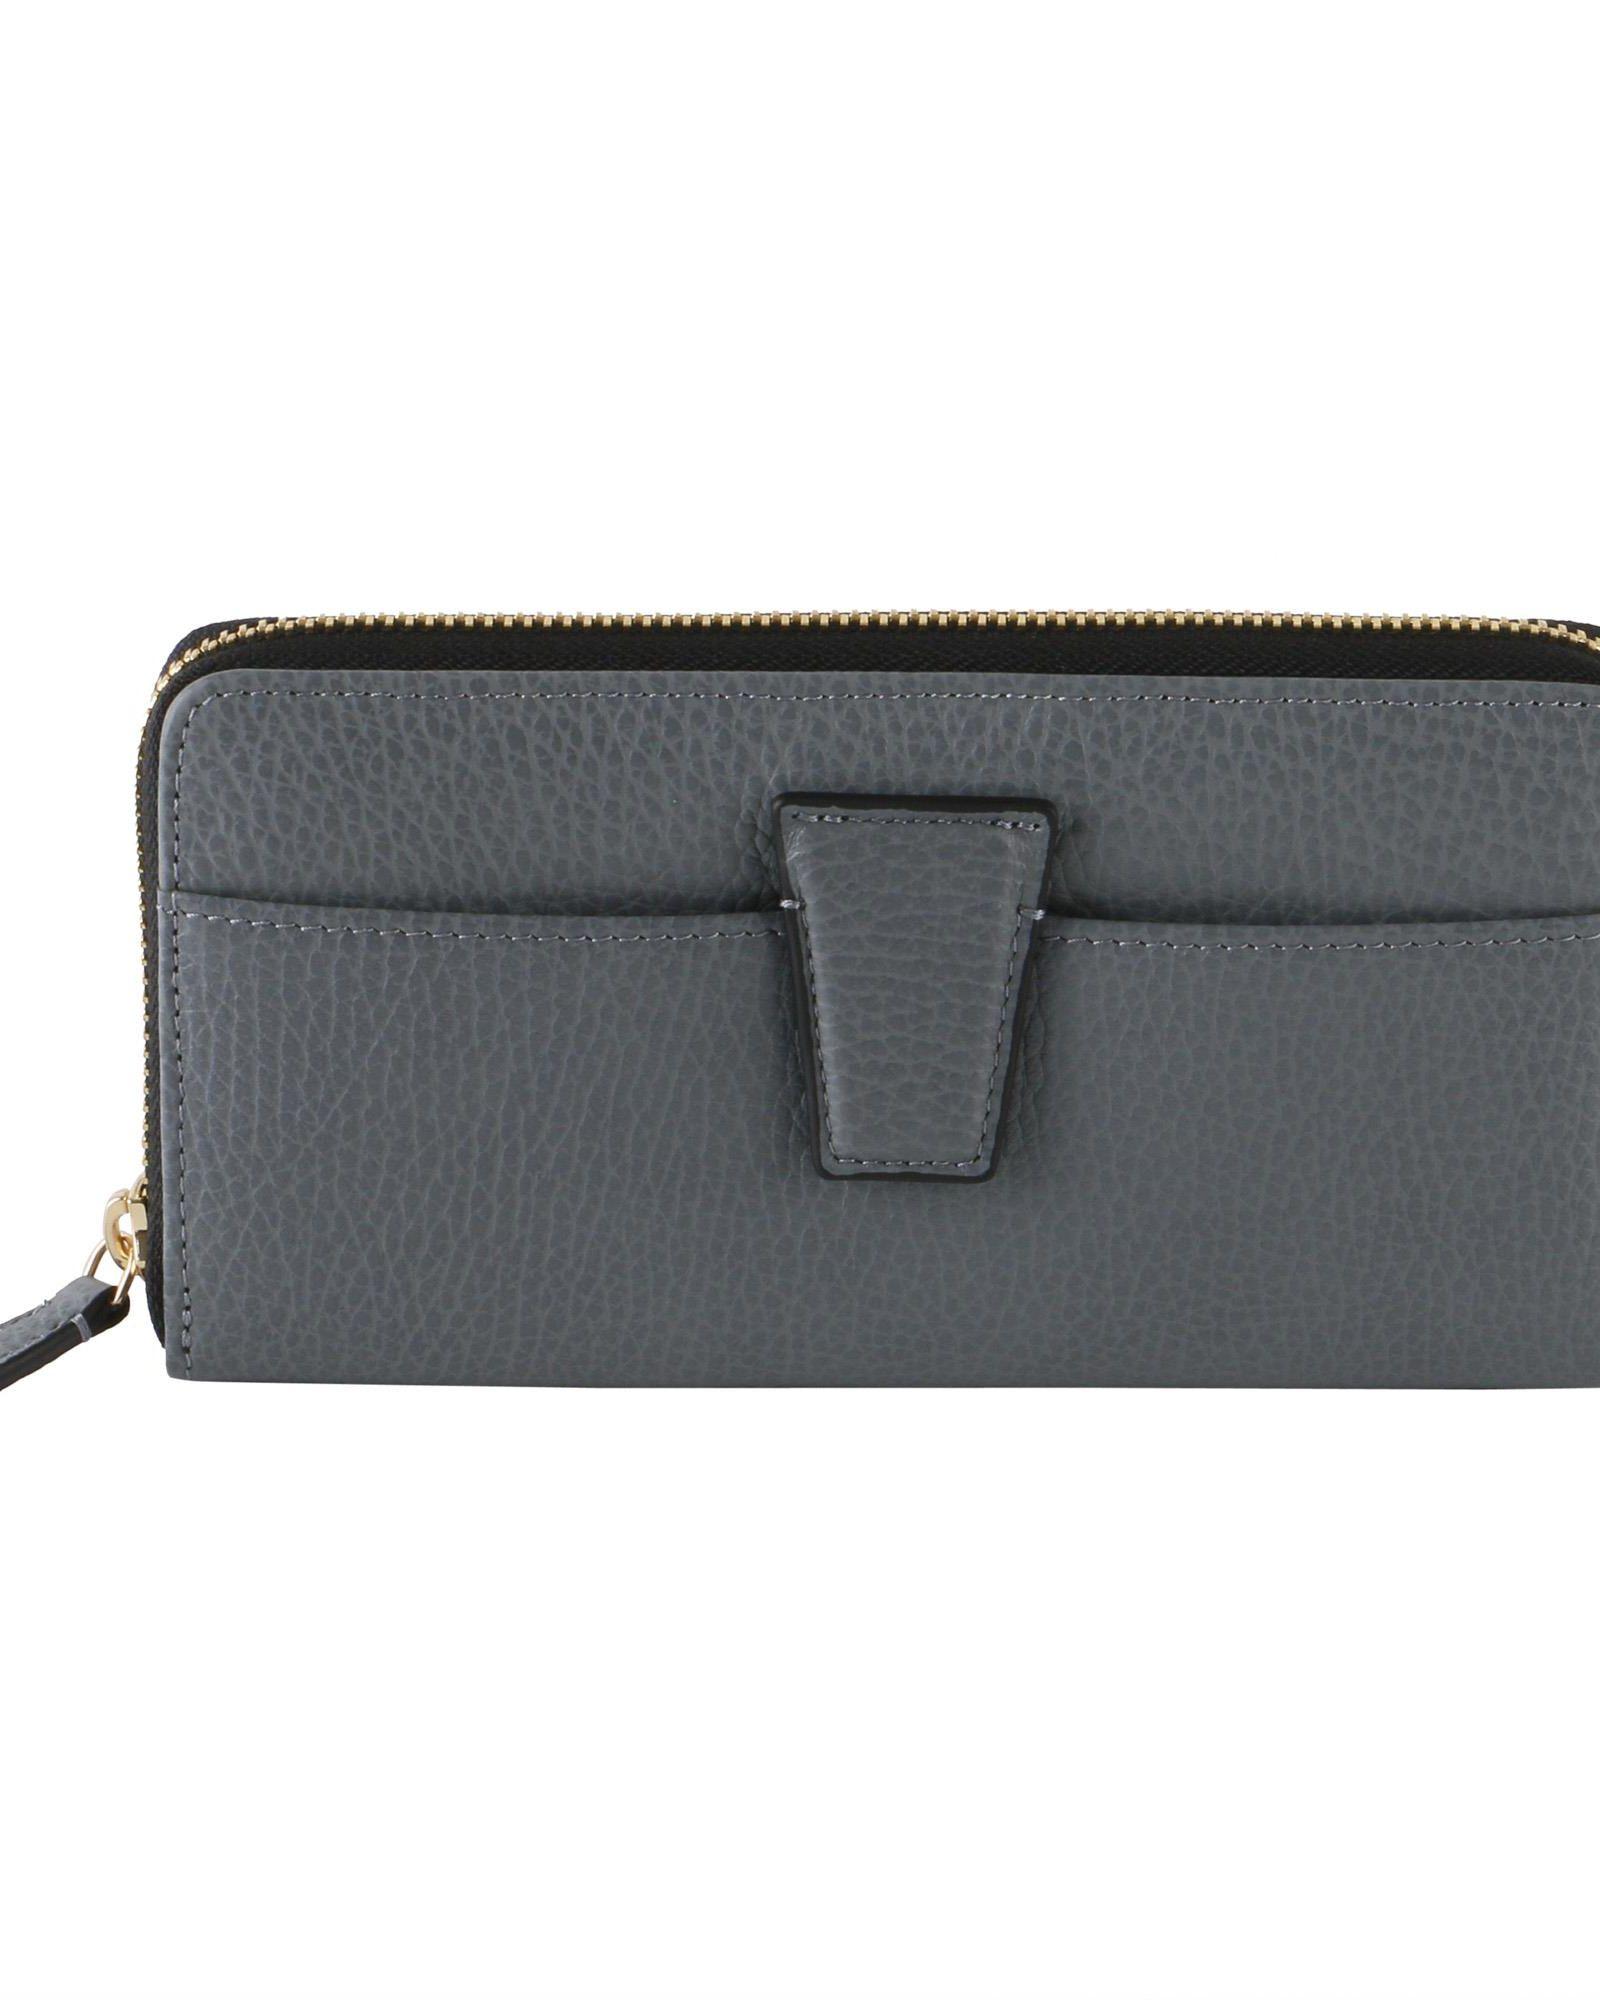 GIANNI CHIARINI Stormy Grained Leather Wallet in Dark Grey